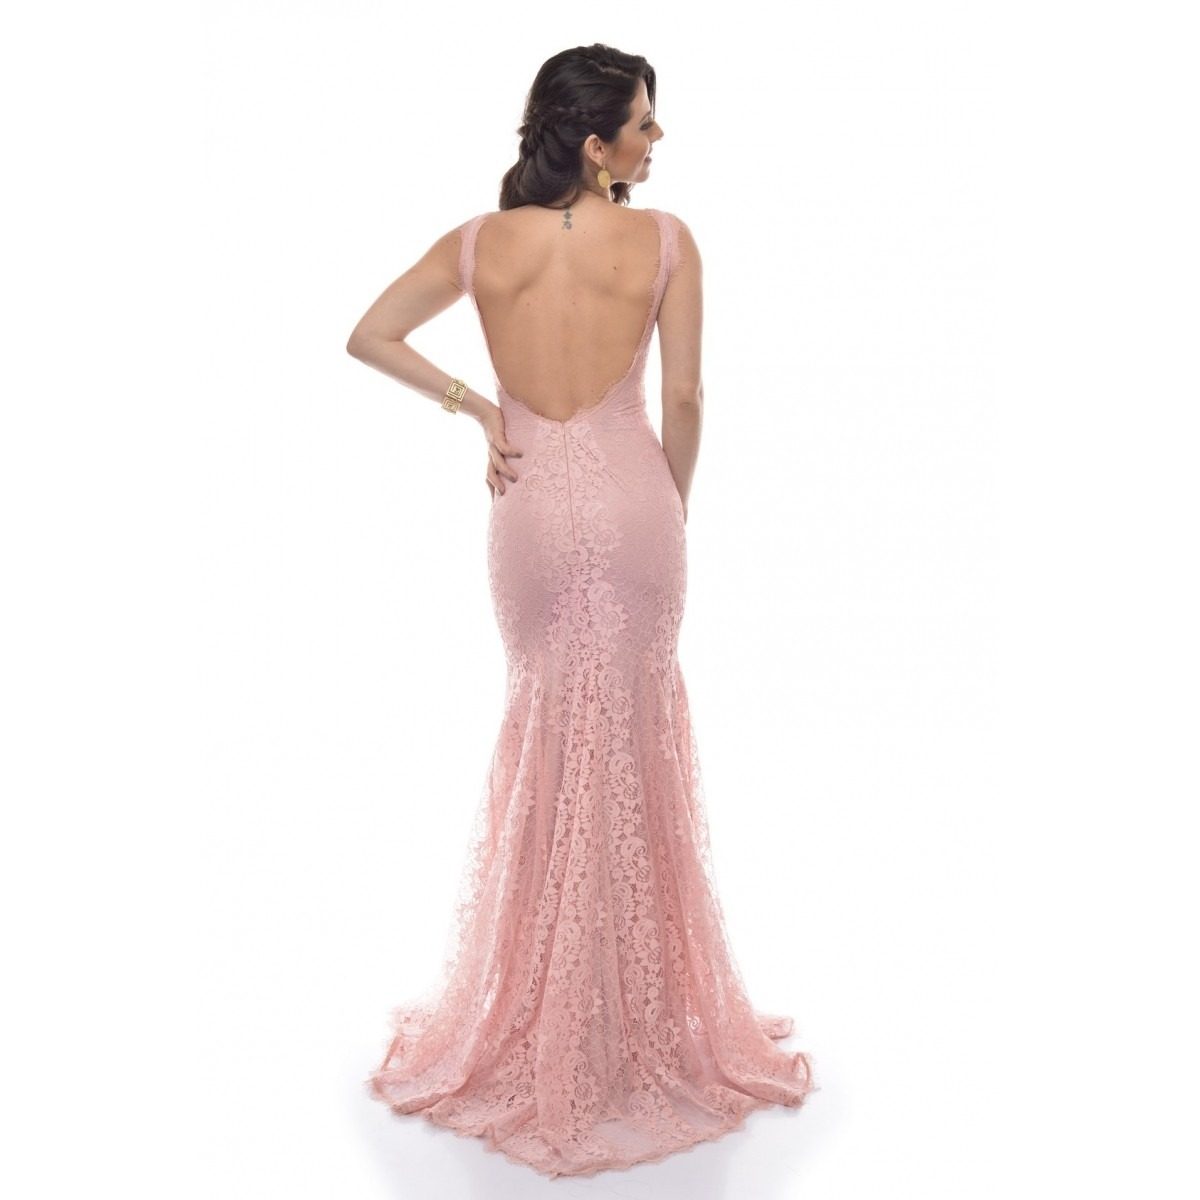 1550742061 vestido longo festa rendado decote canoa georgia - rosa. Carregando zoom.